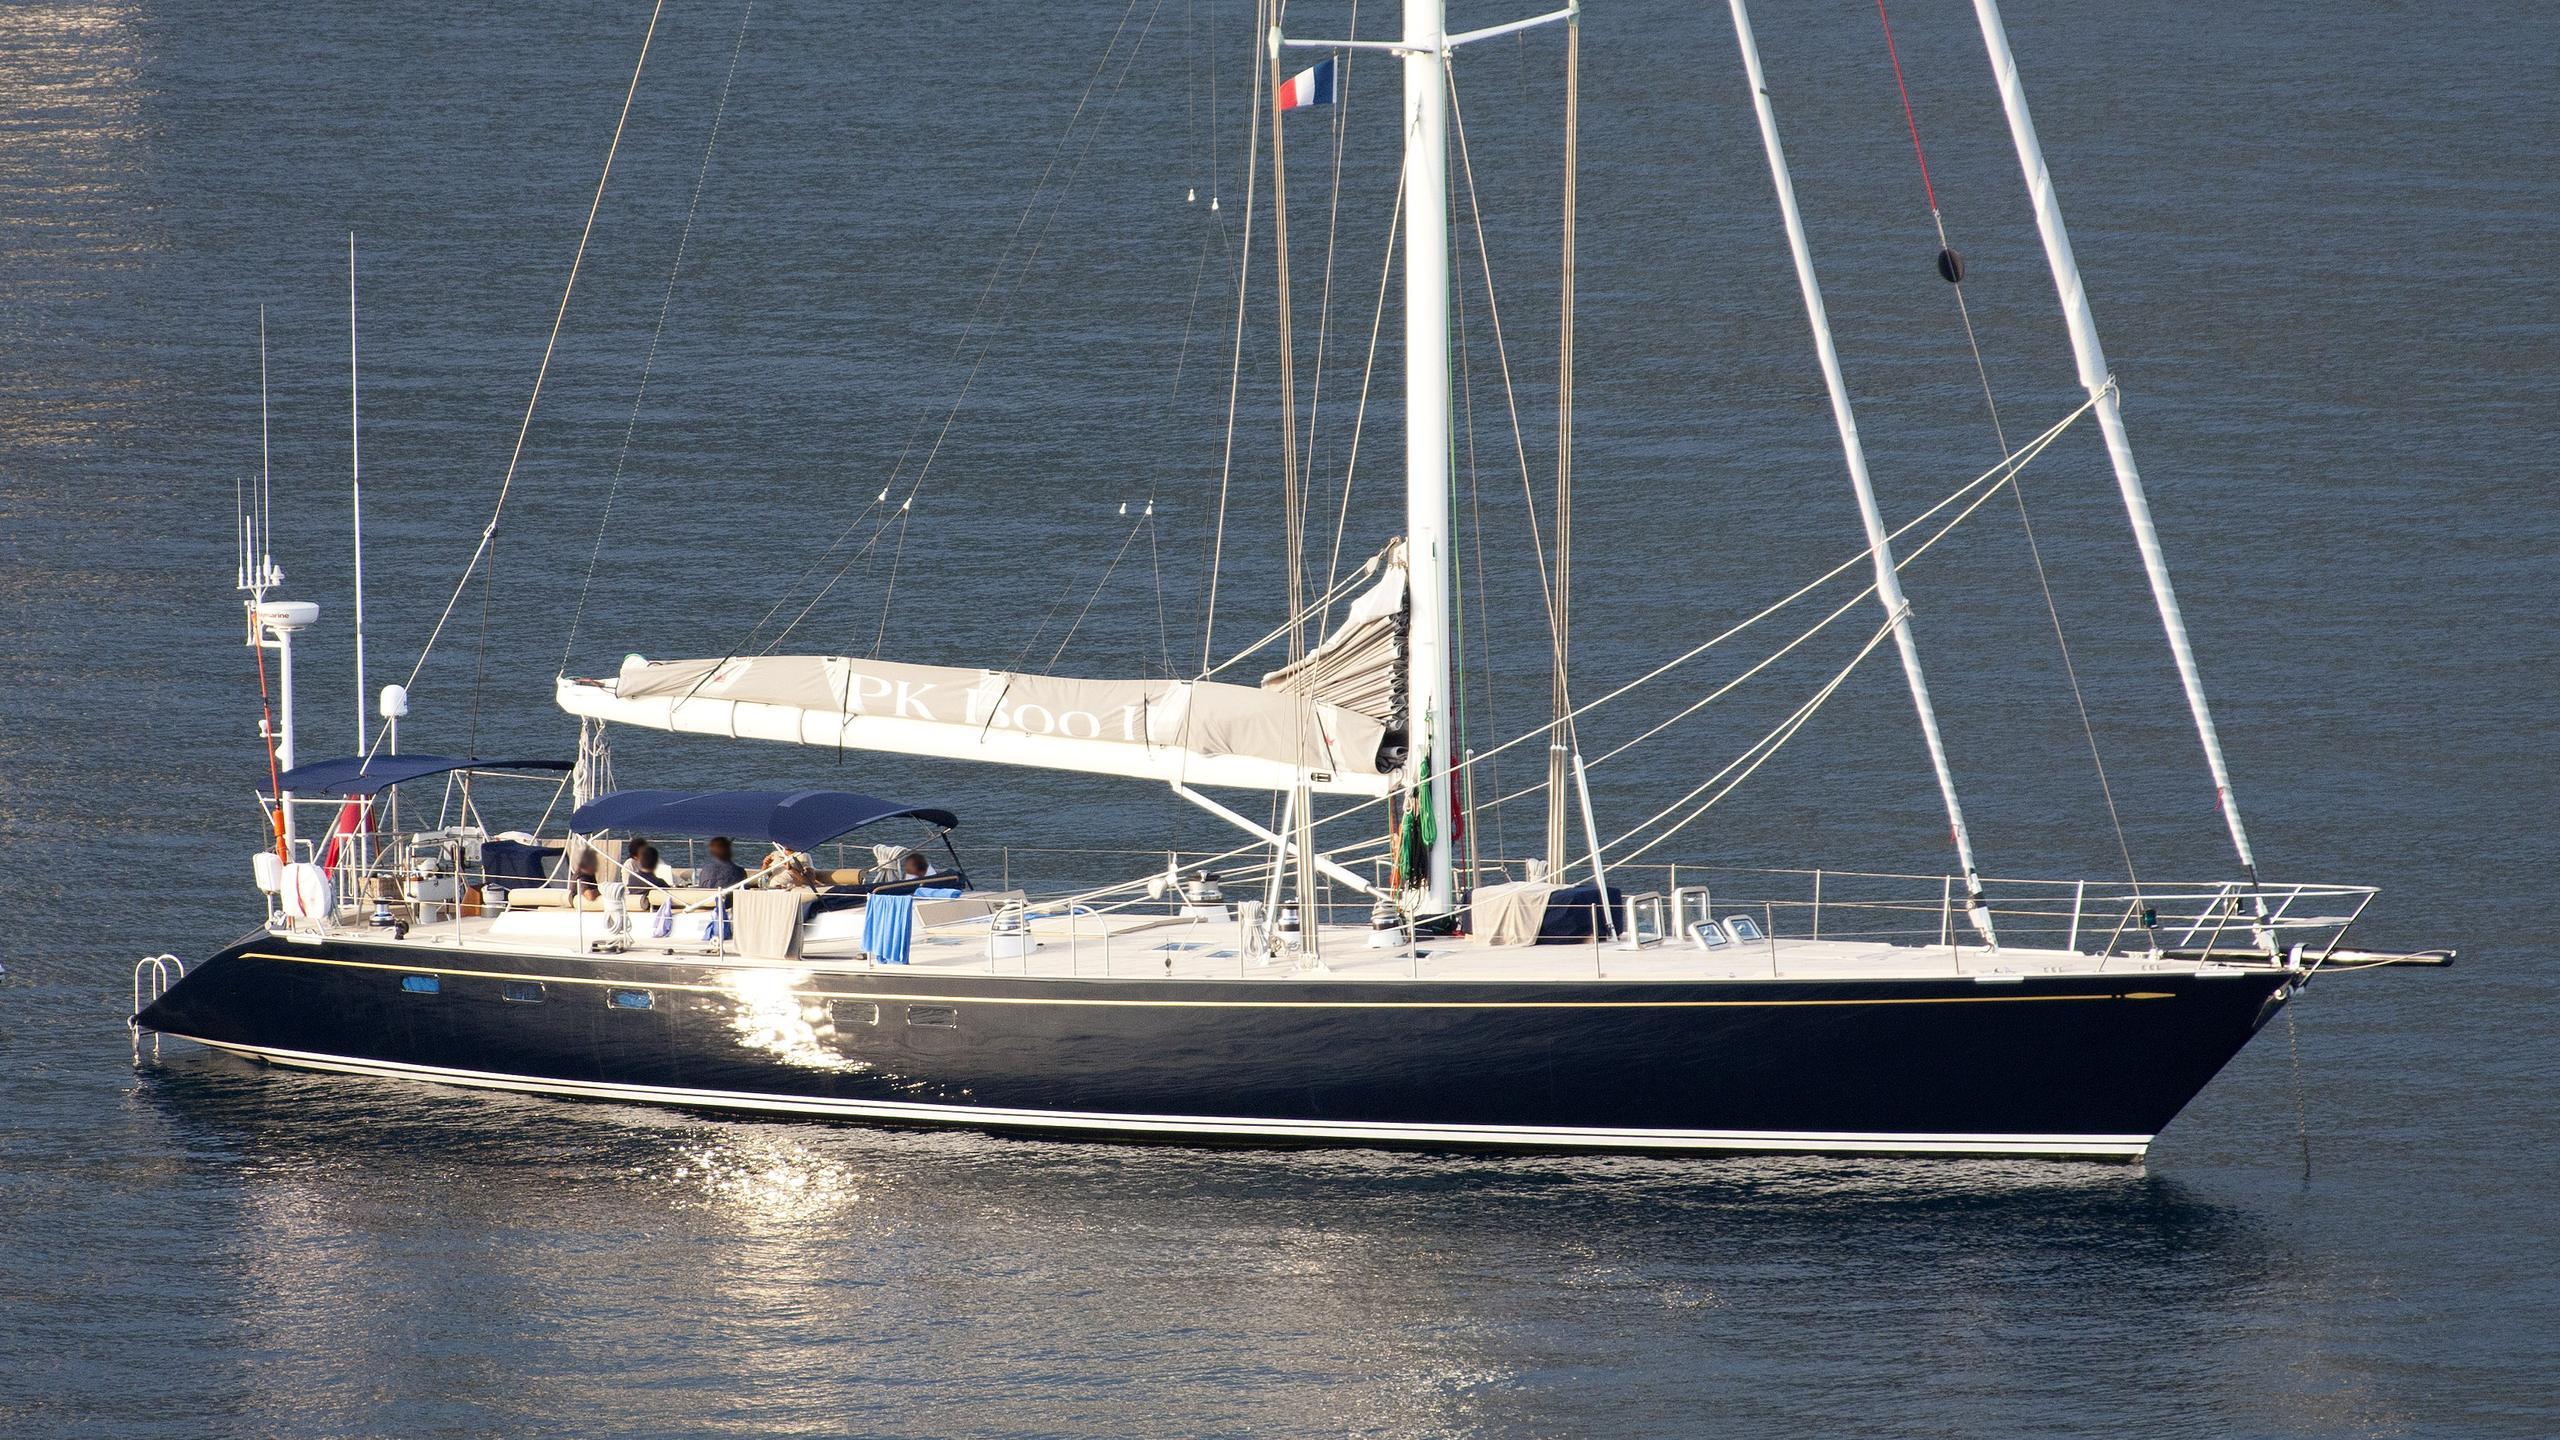 pk-boo-ii-sailing-yacht-trehard-1982-28m-profile